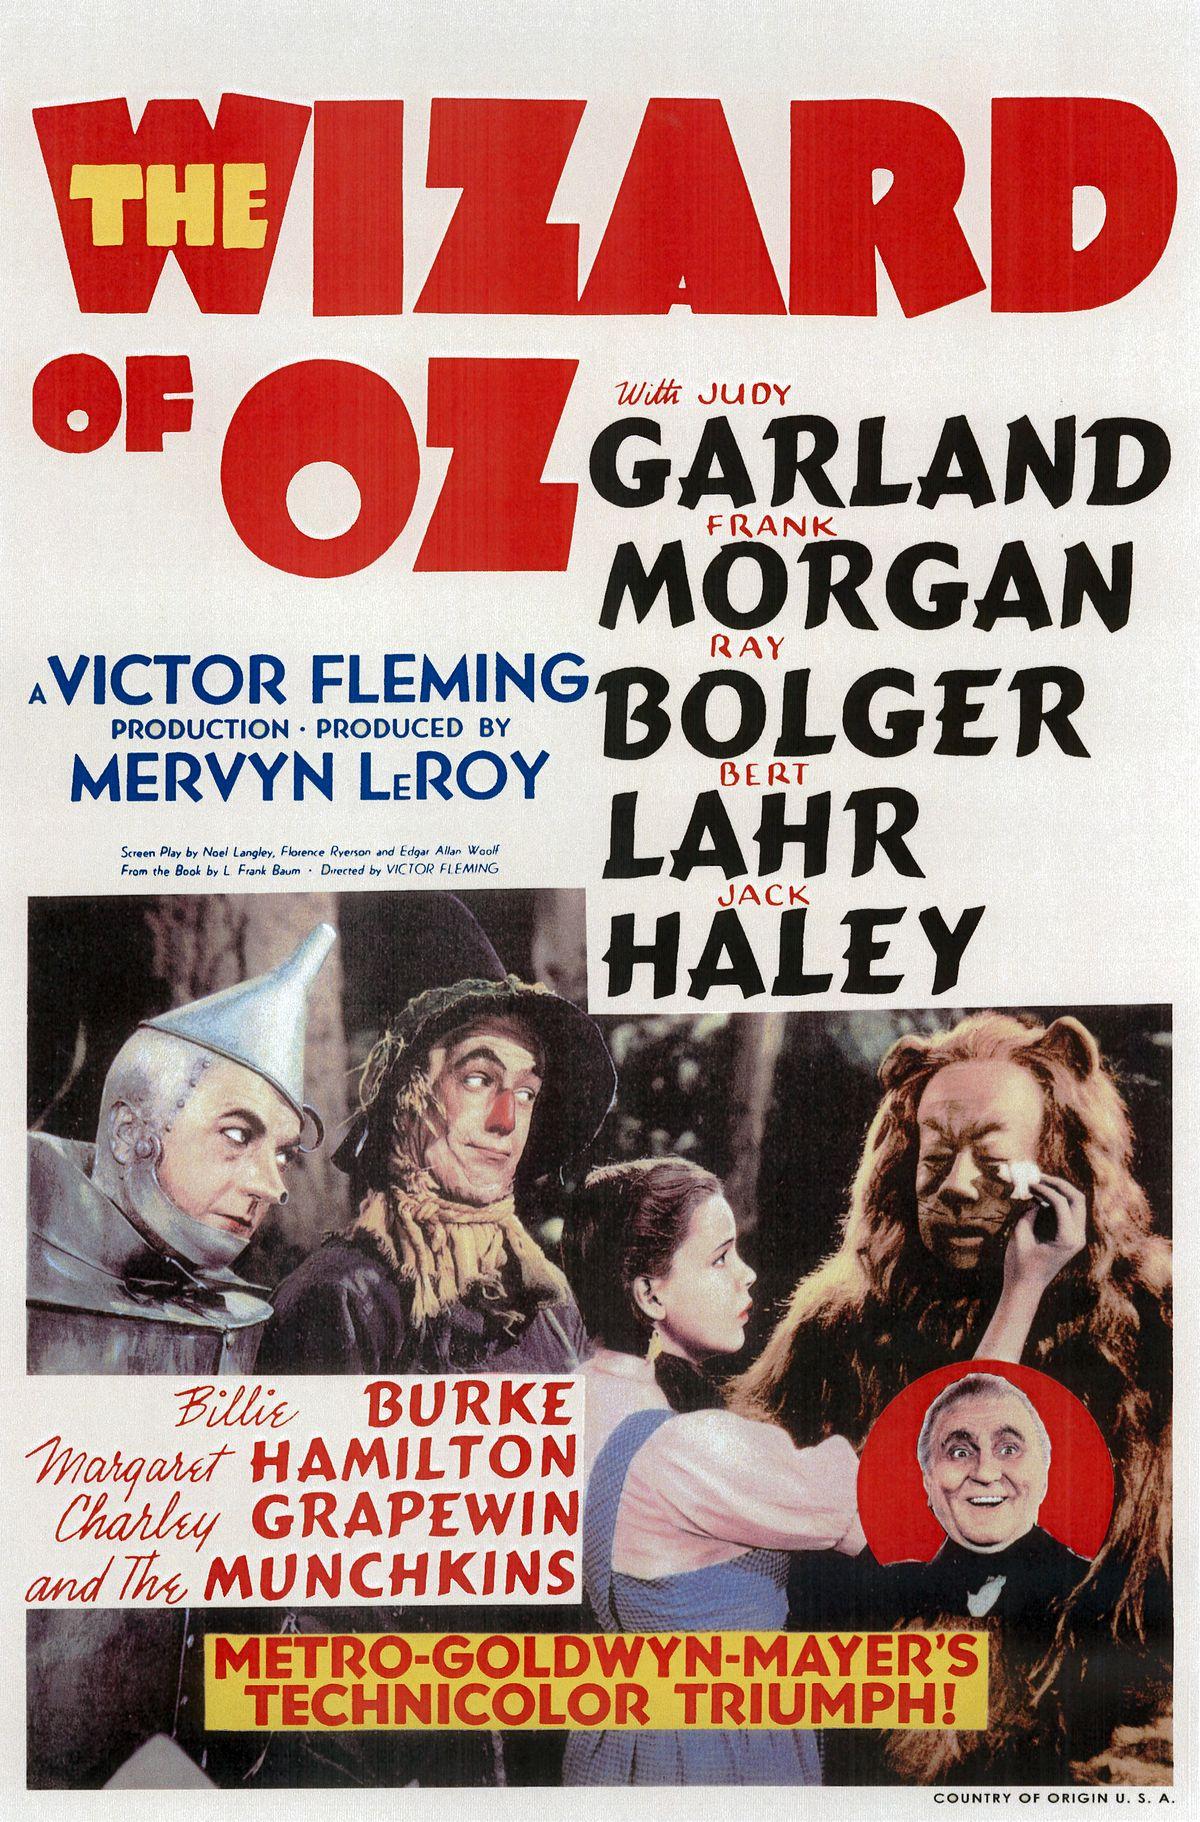 WIZARD_OF_OZ_ORIGINAL_POSTER_1939.jpg